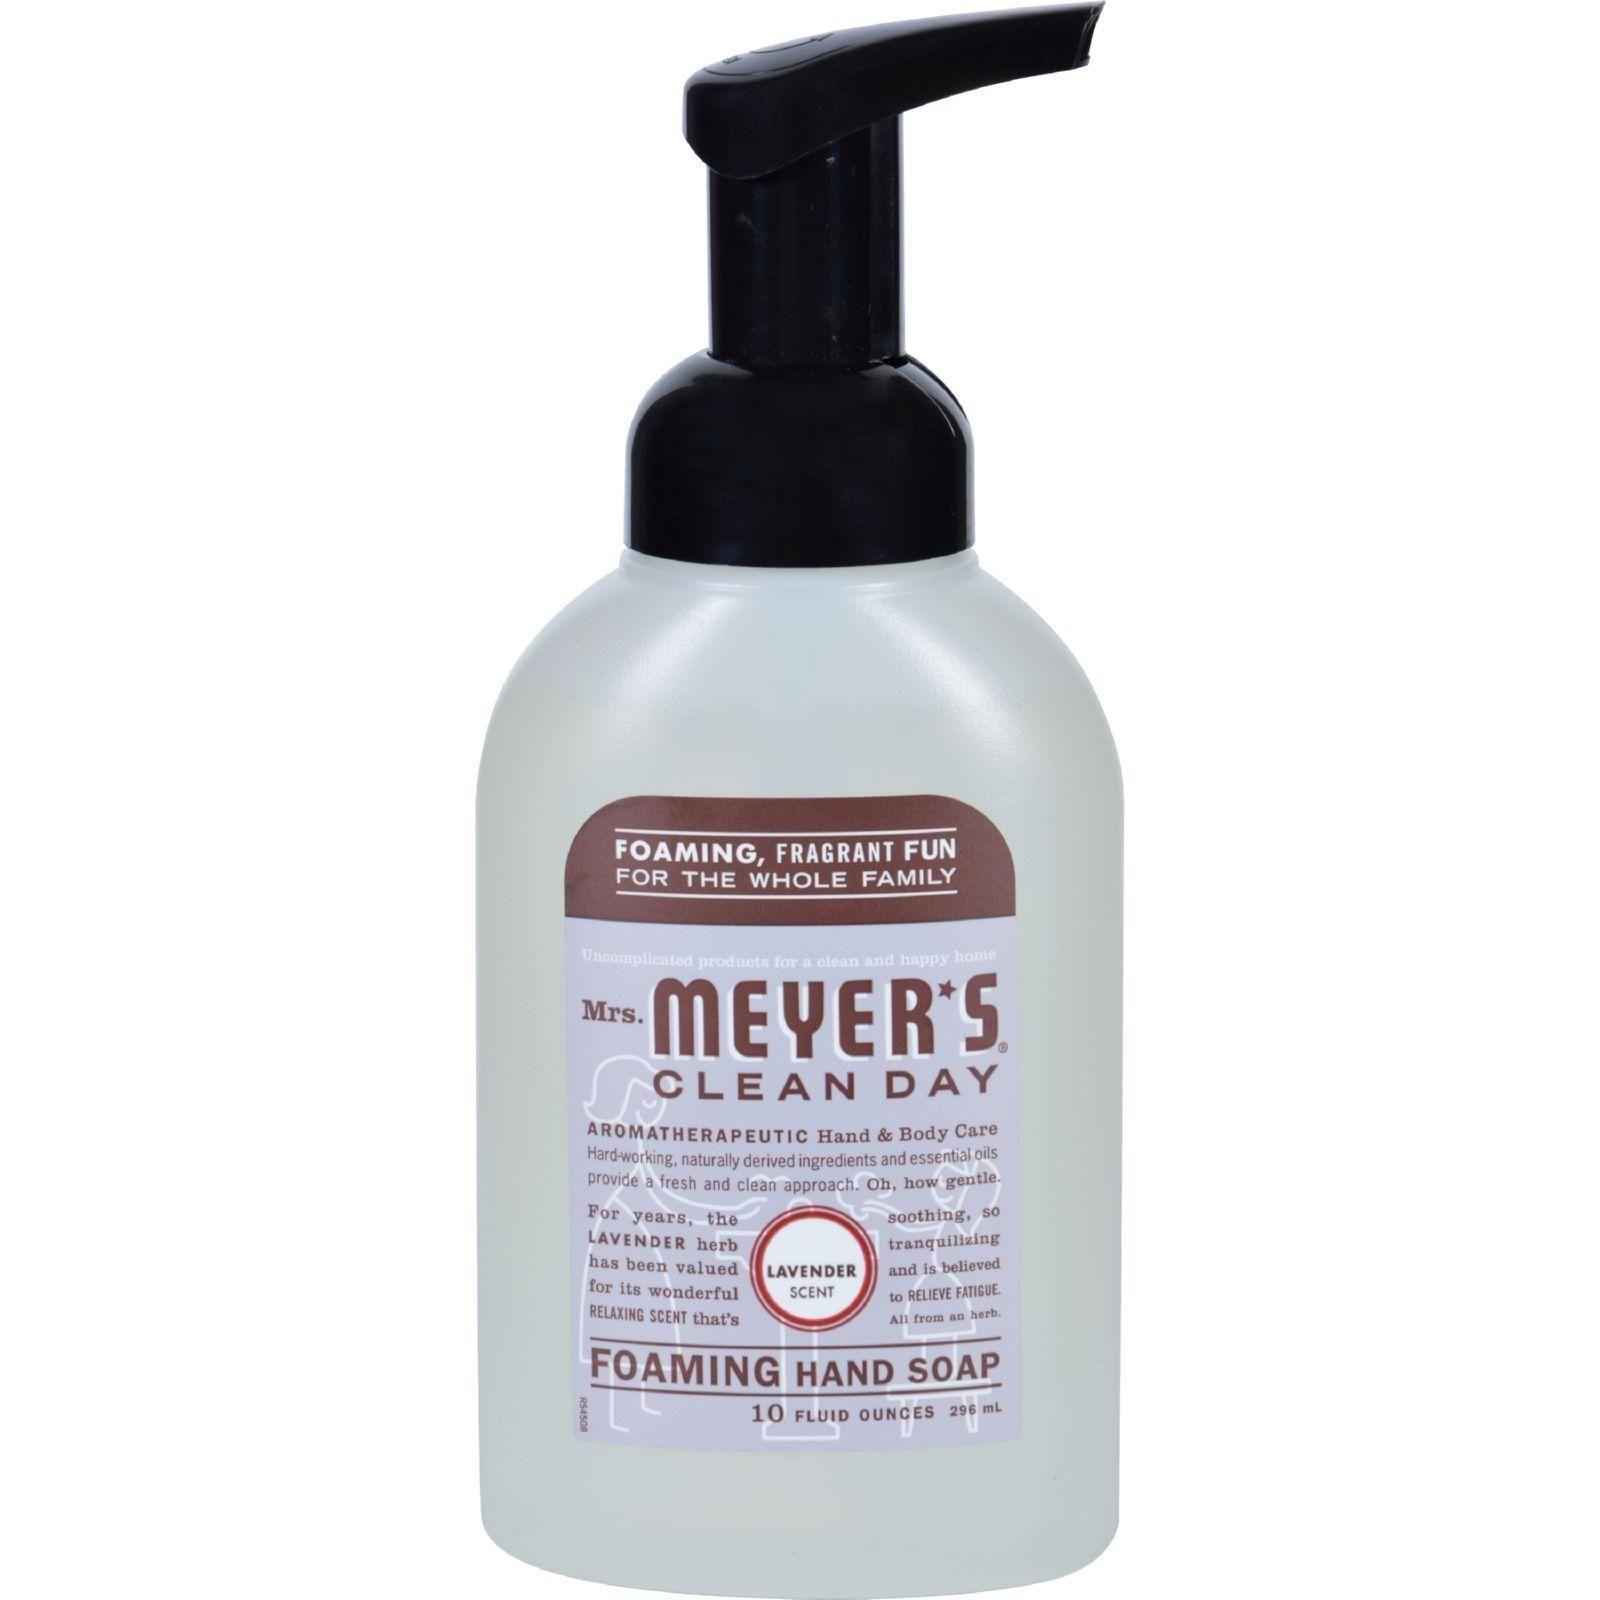 Mrs Meyer S Foaming Hand Soap Lavender Case Of 6 10 Fl Oz Foaming Hand Soap Skin Cream Recipes Soap